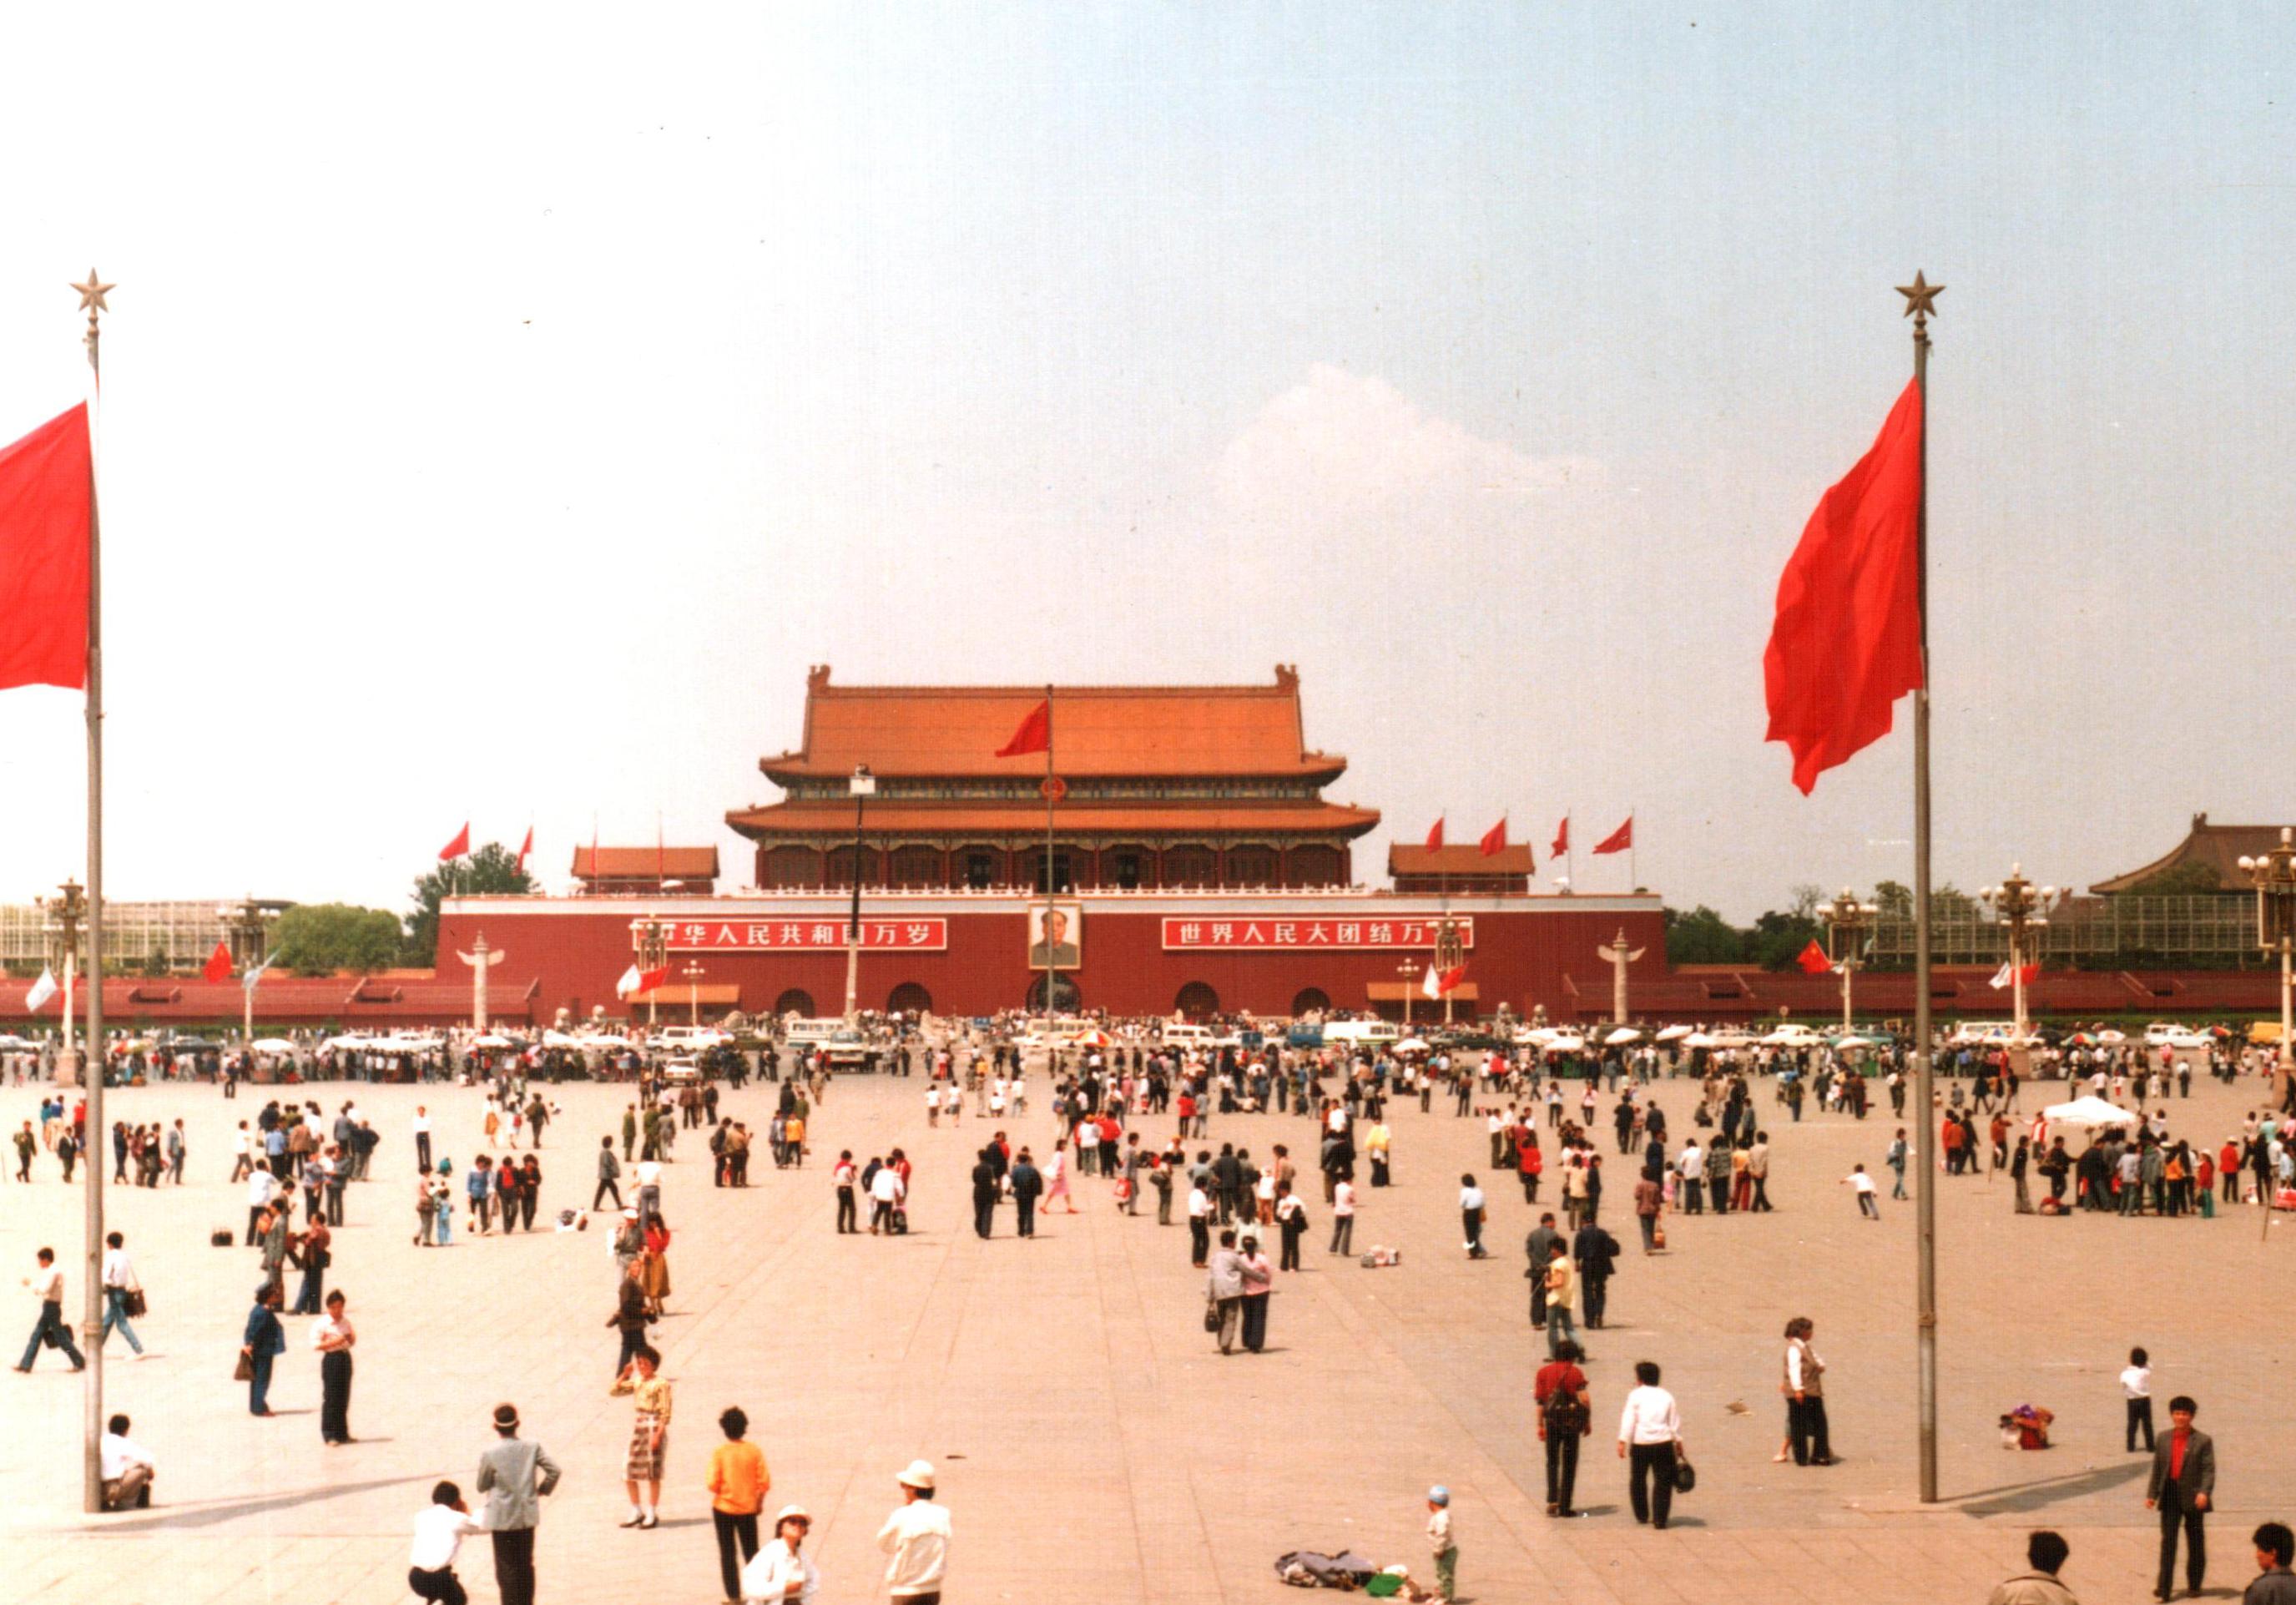 Tiananmen Square in May 1988 (Photo: Wikipedia)